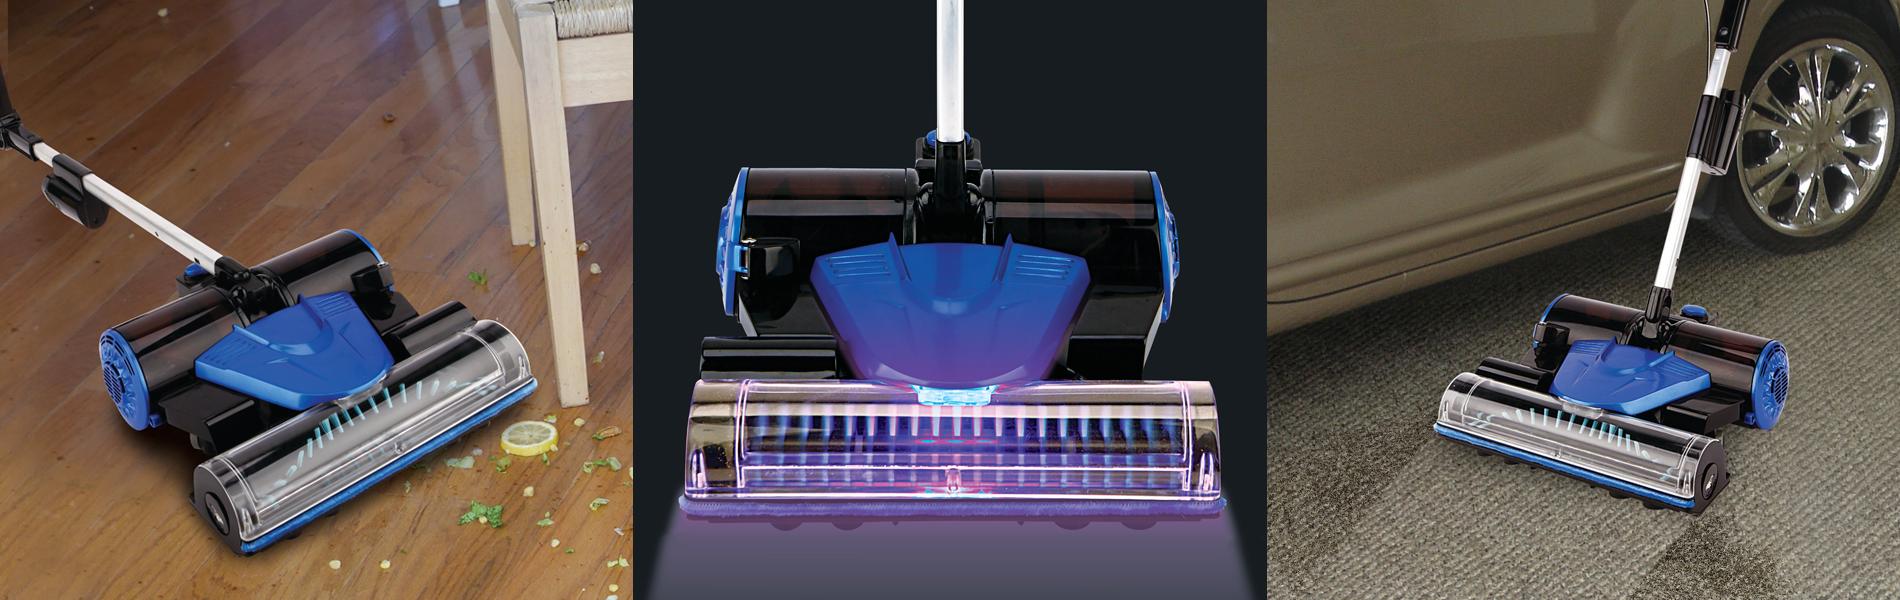 360* Cordless Spinner-Vac